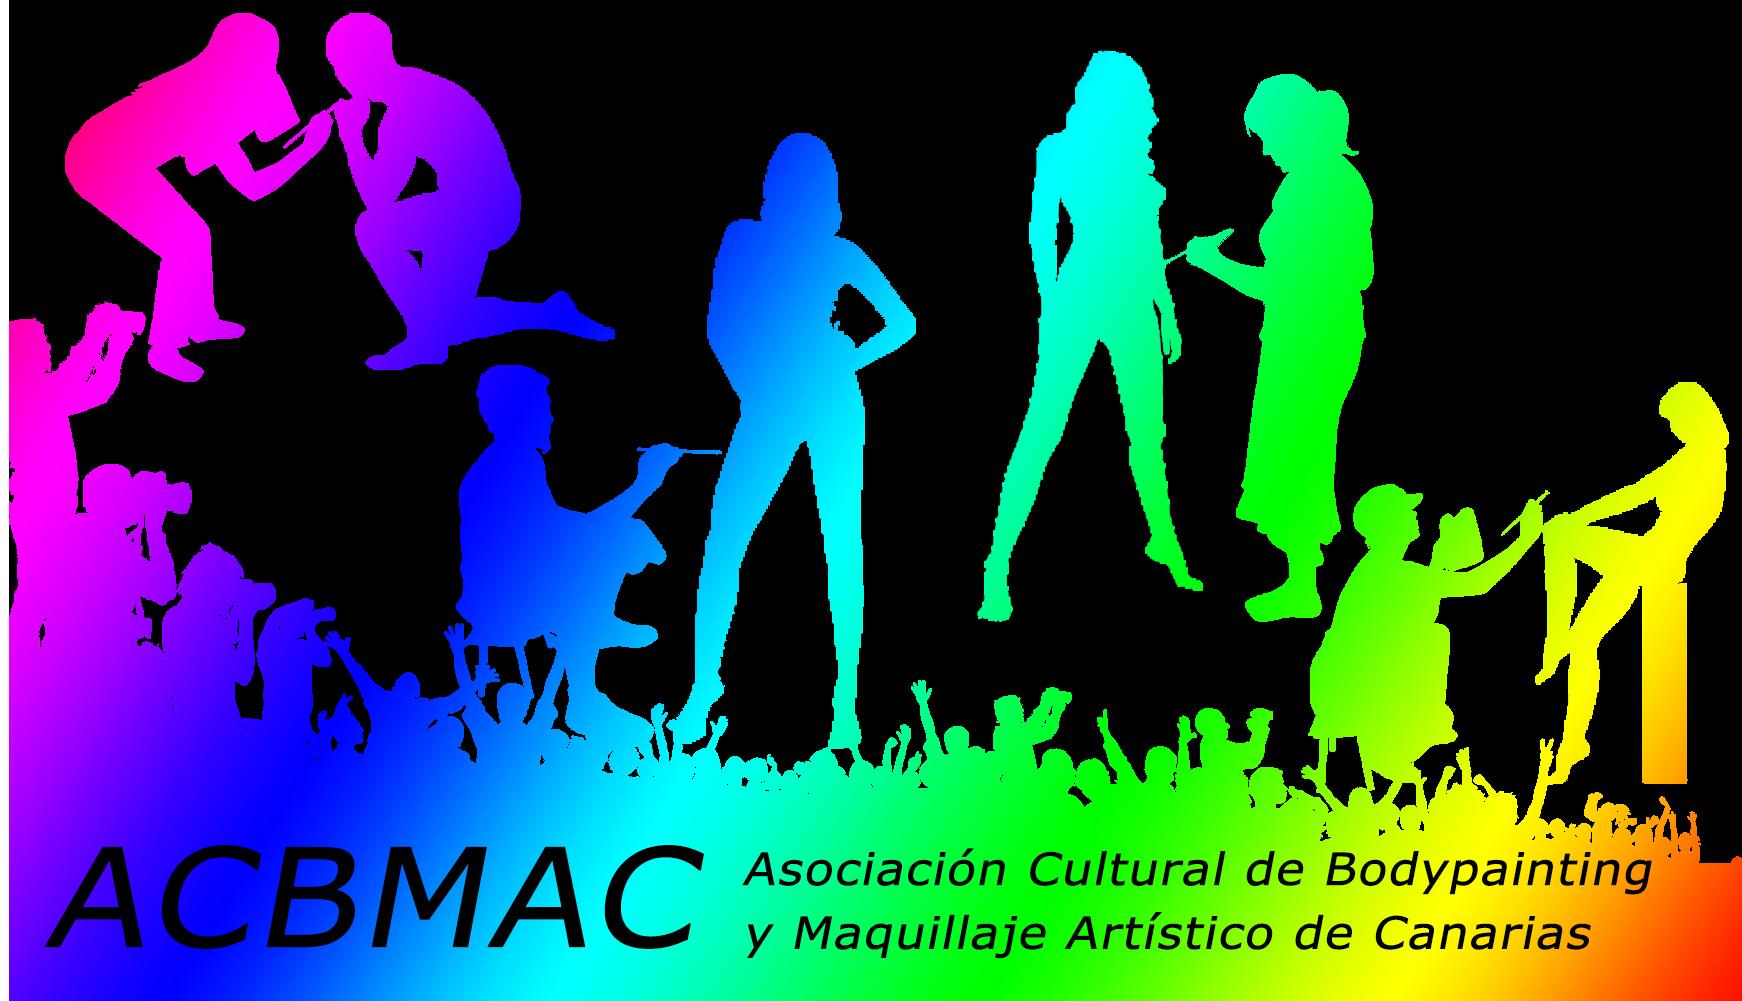 acbmac